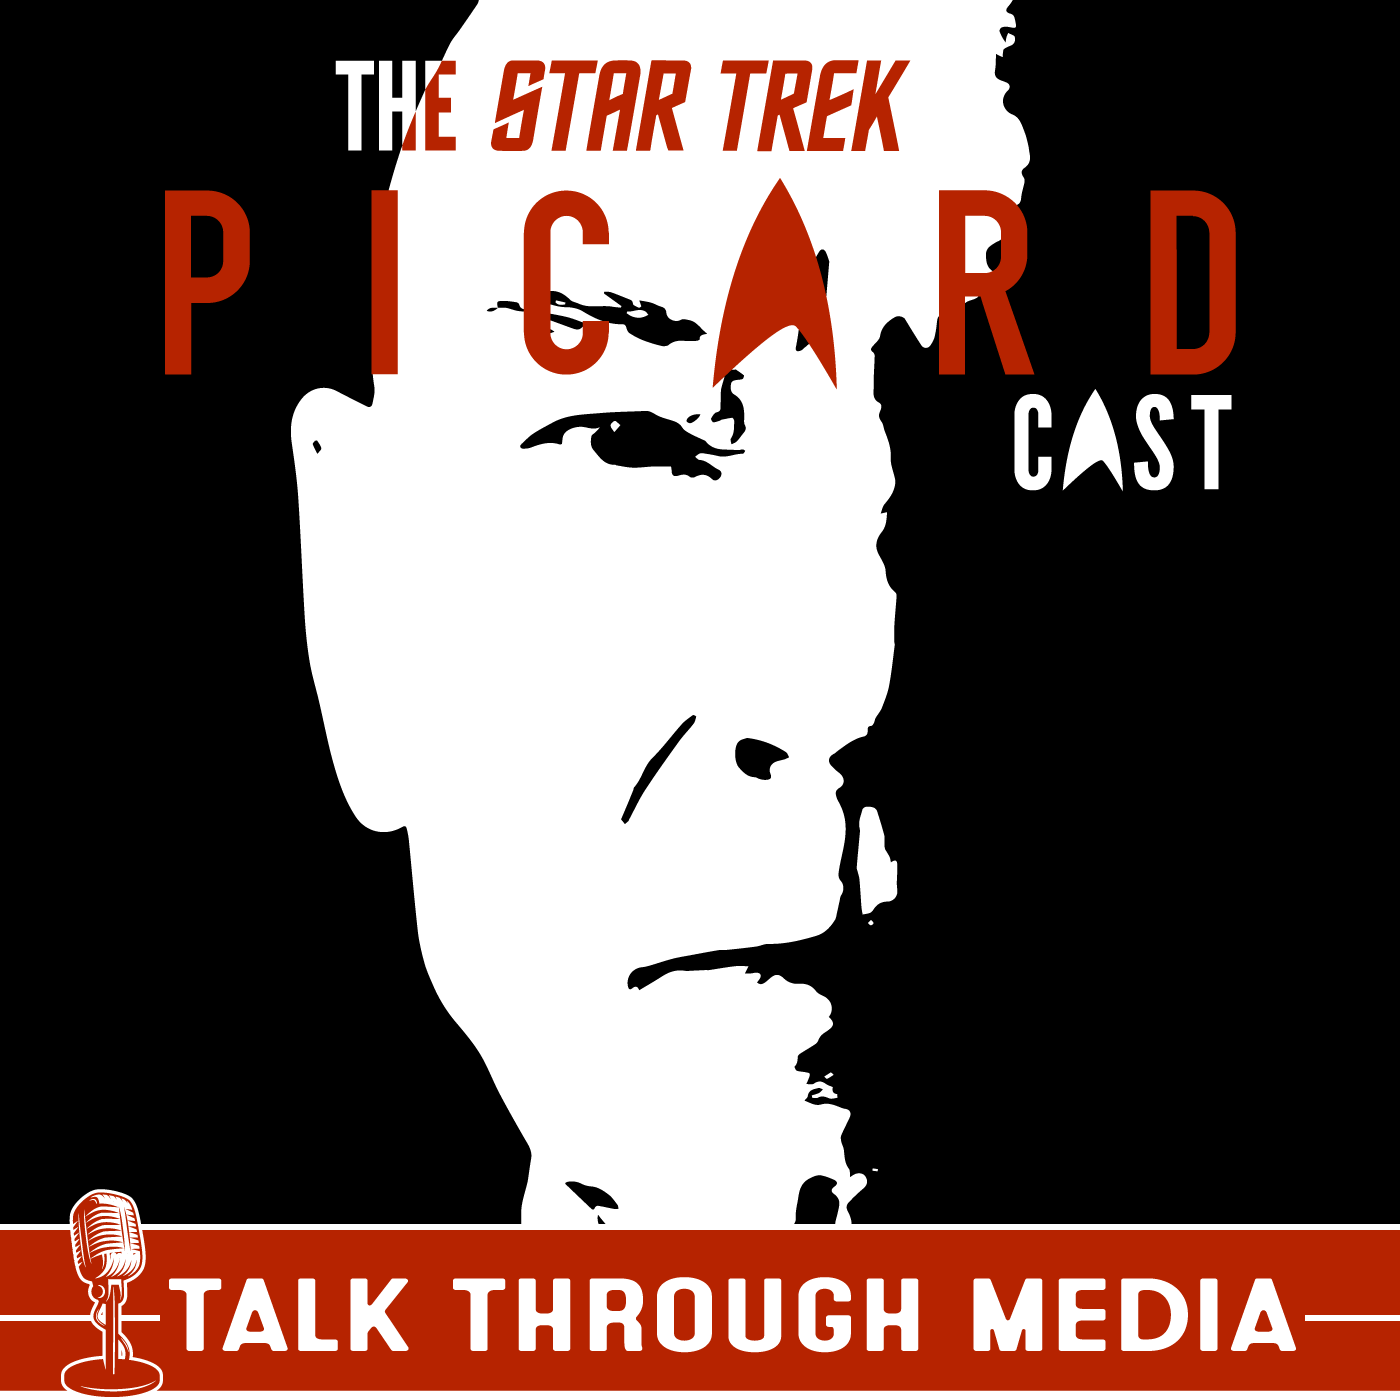 The Star Trek Picard Cast